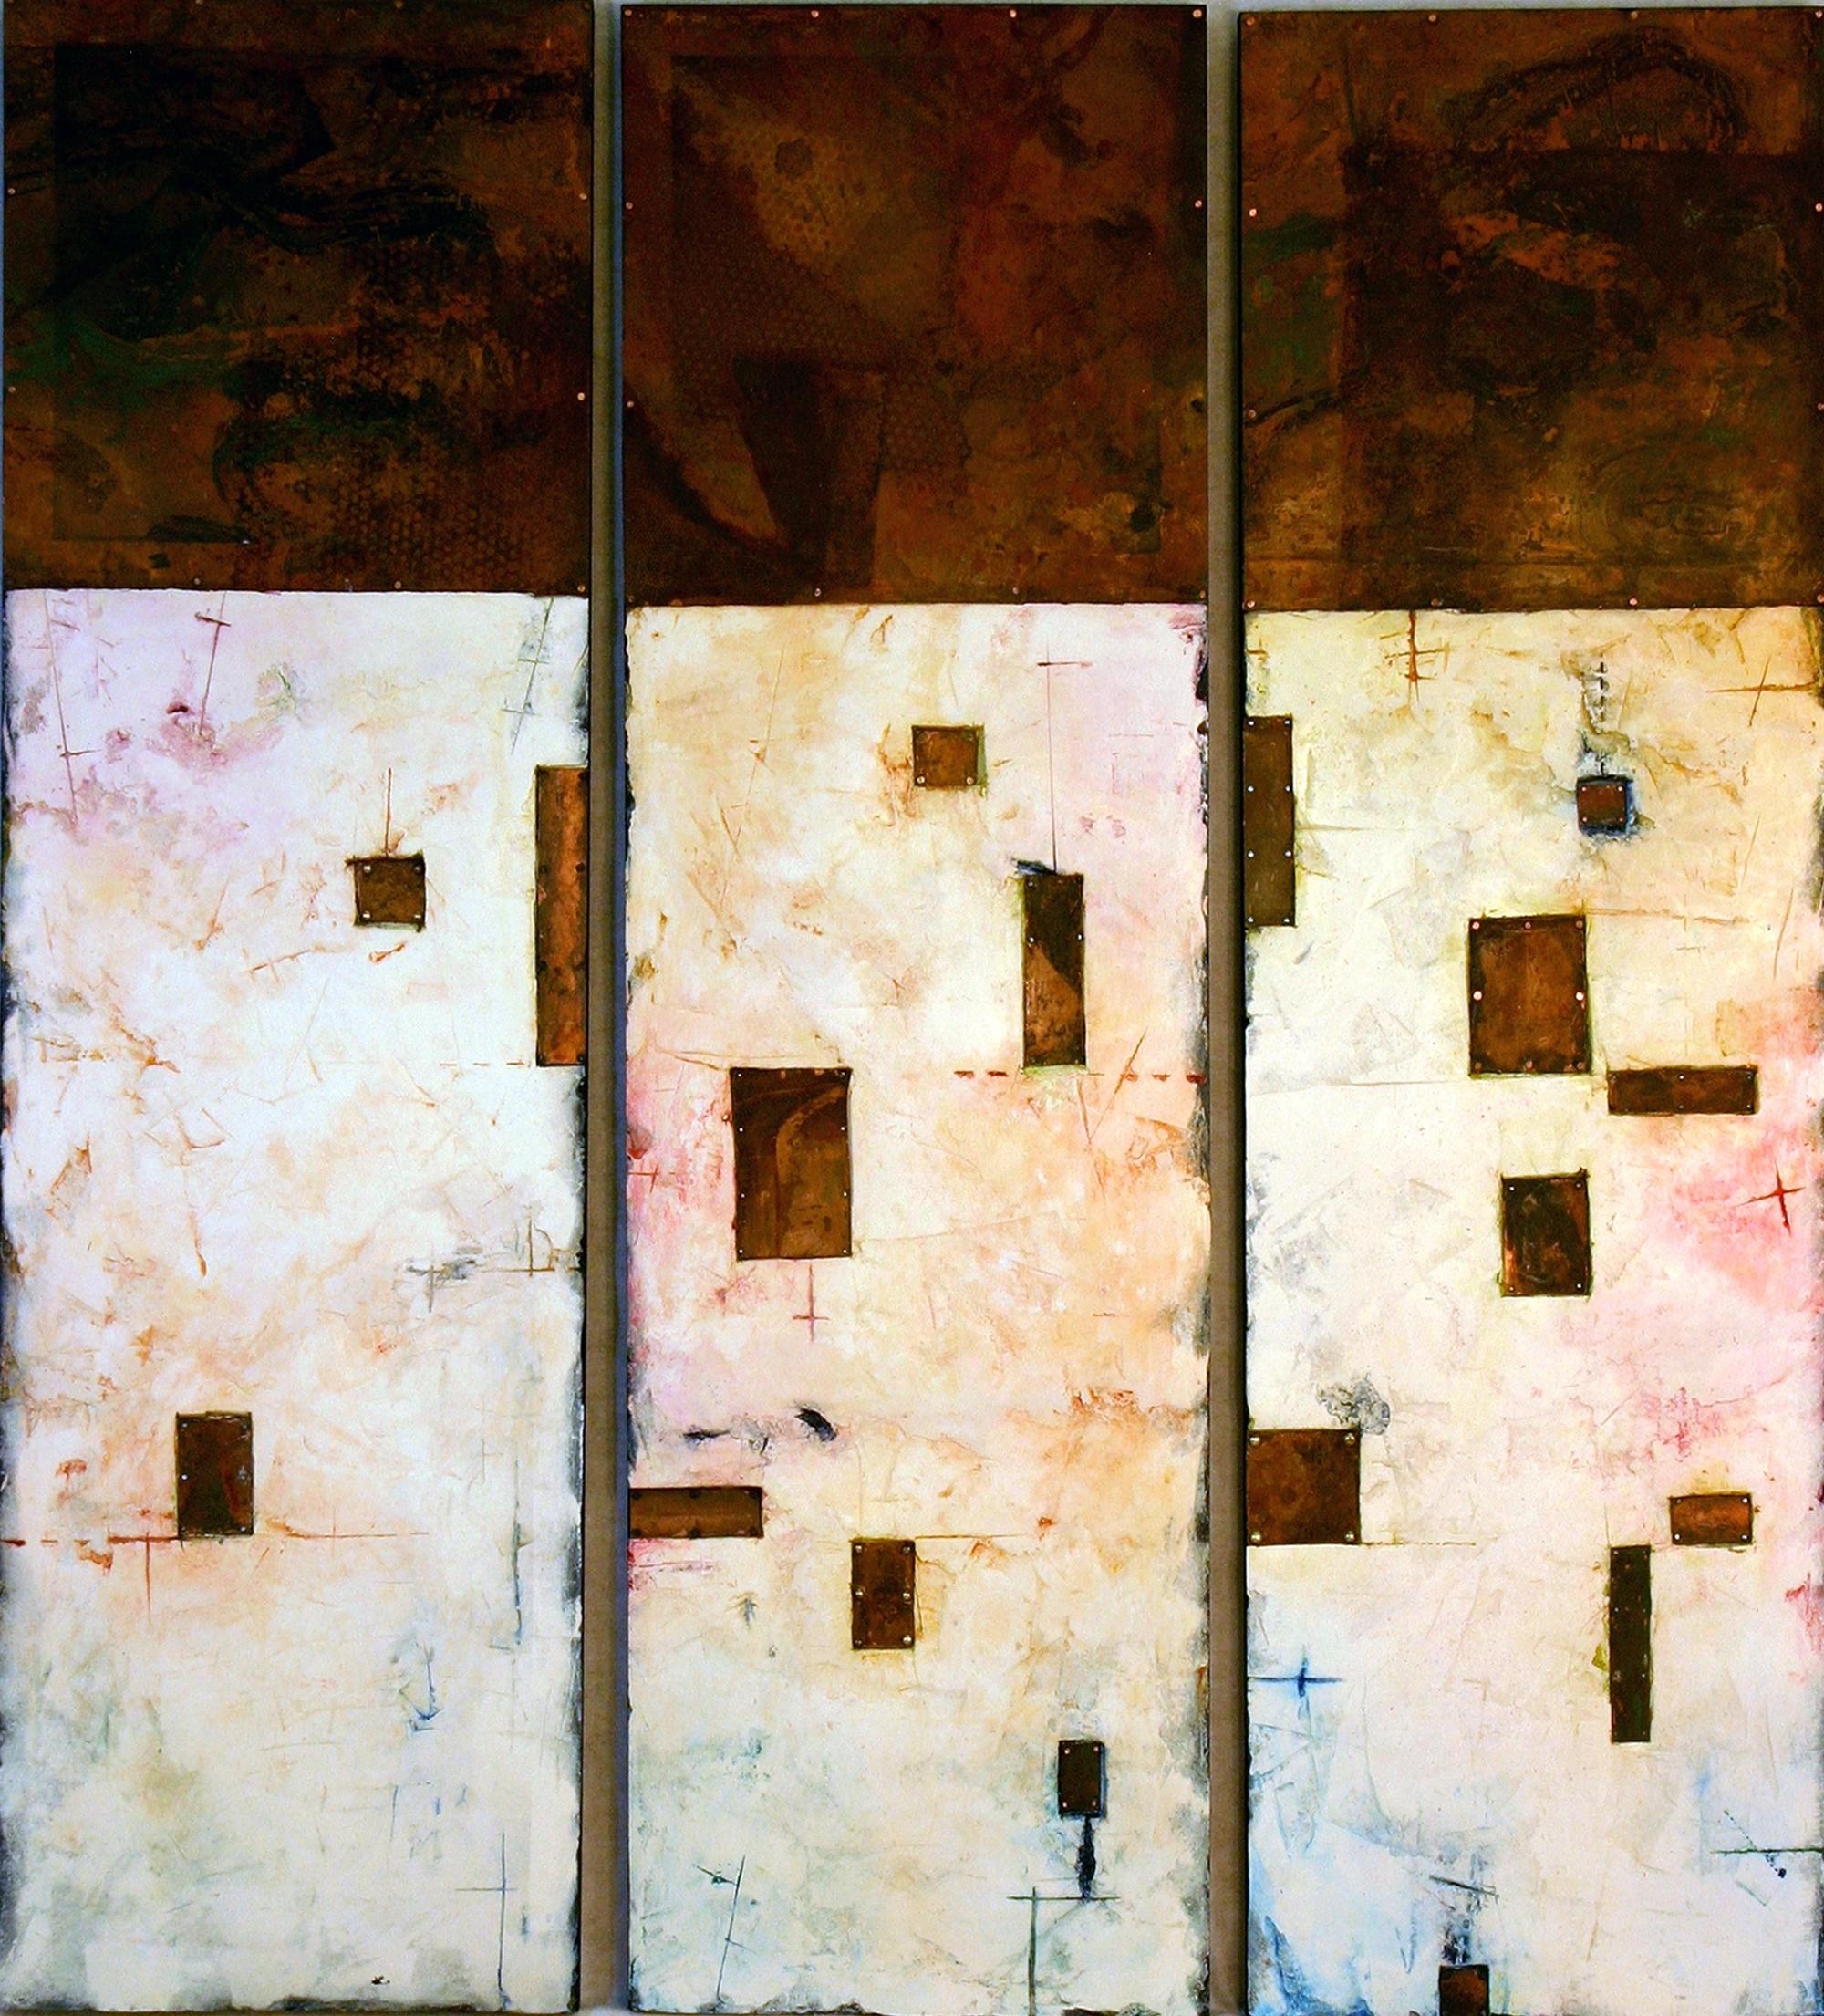 Three.6 by Curtis Olson